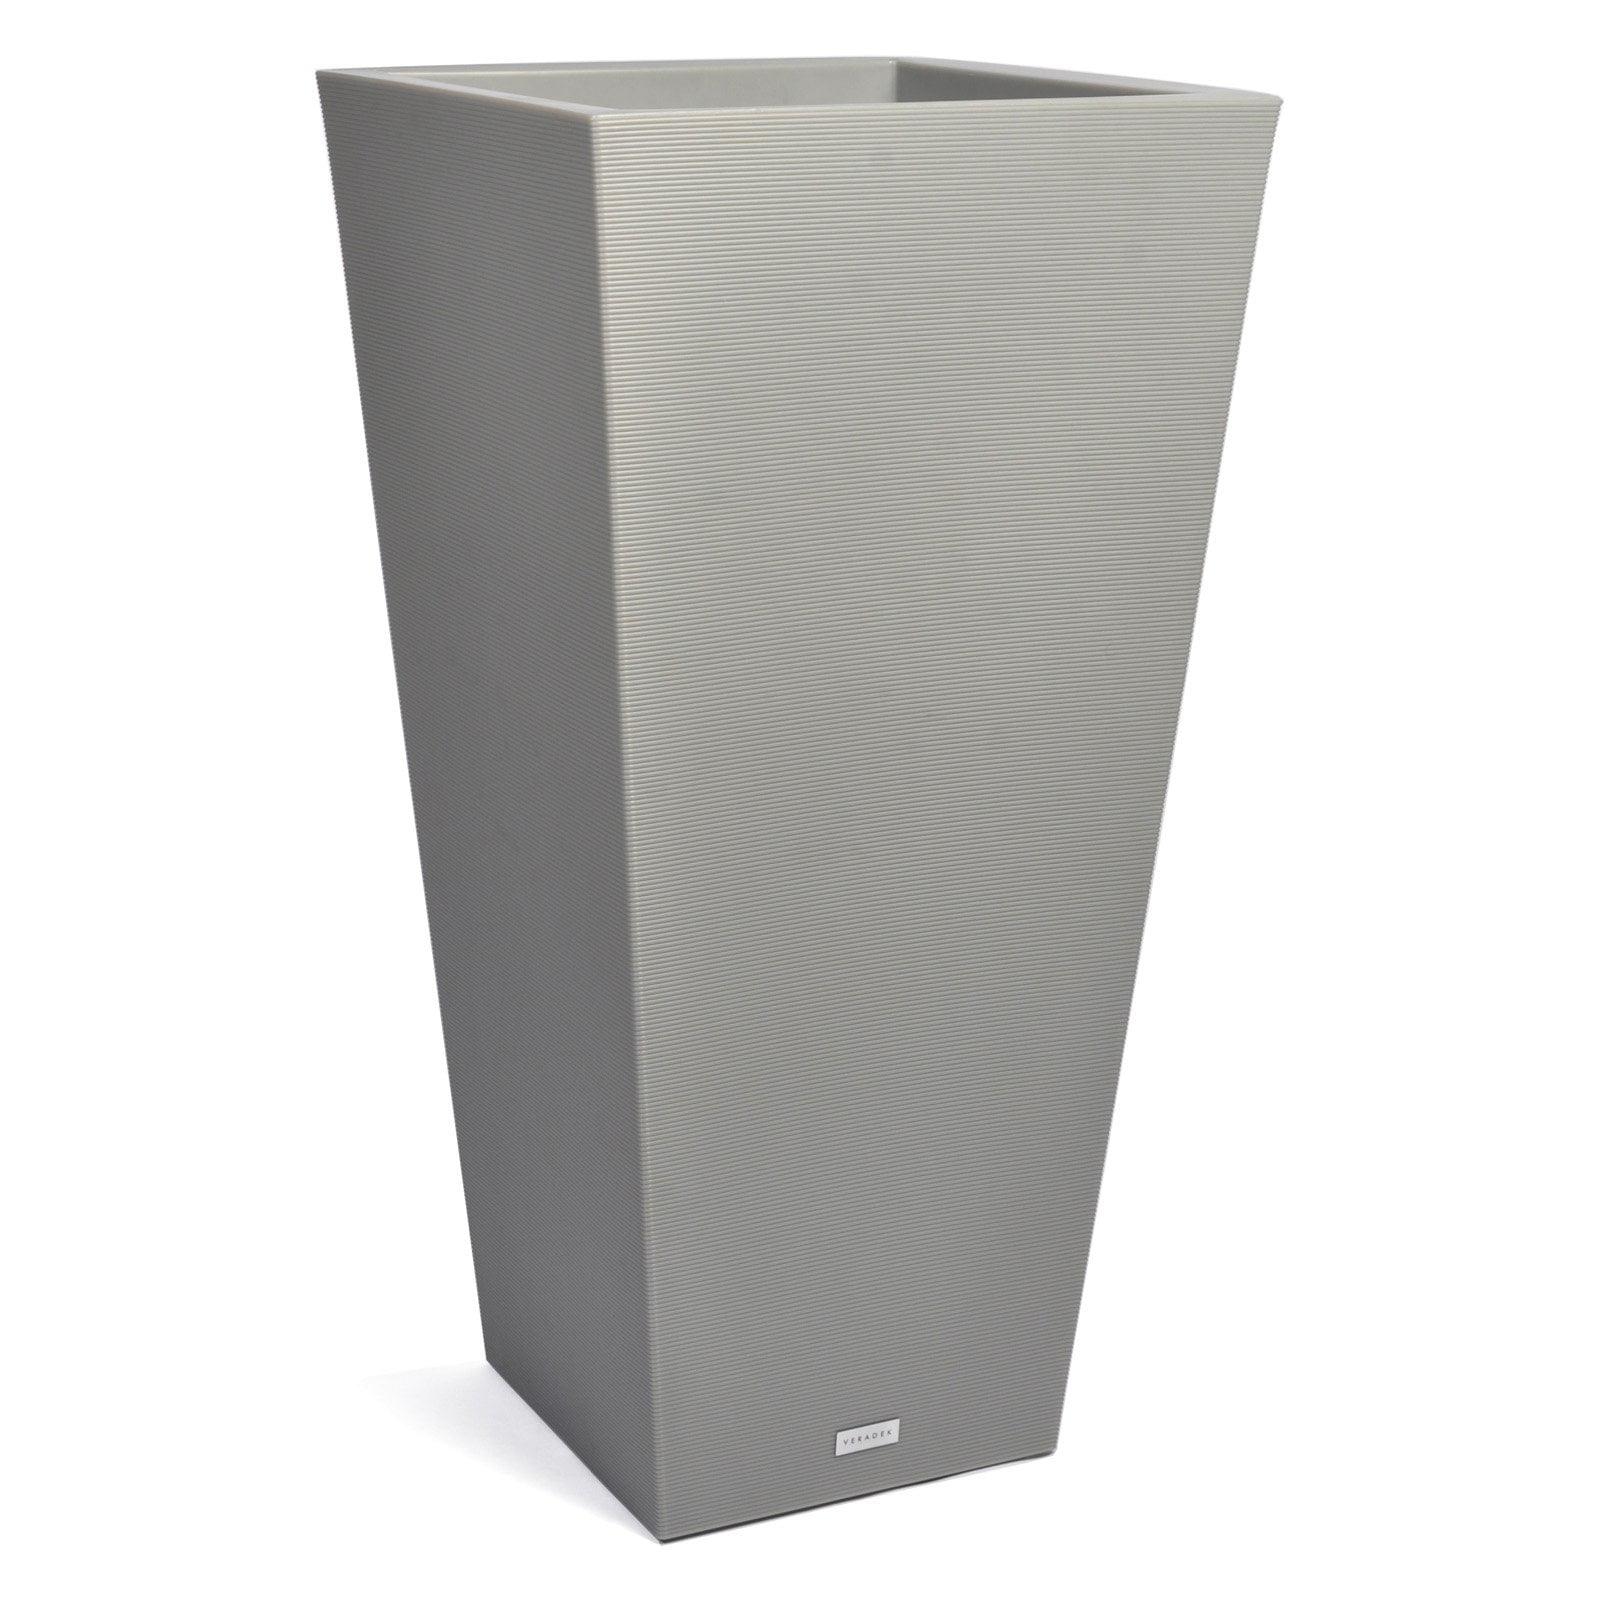 Veradek Pro Series Column 40 in. Grooved Outdoor Square Planter by Veradek Inc